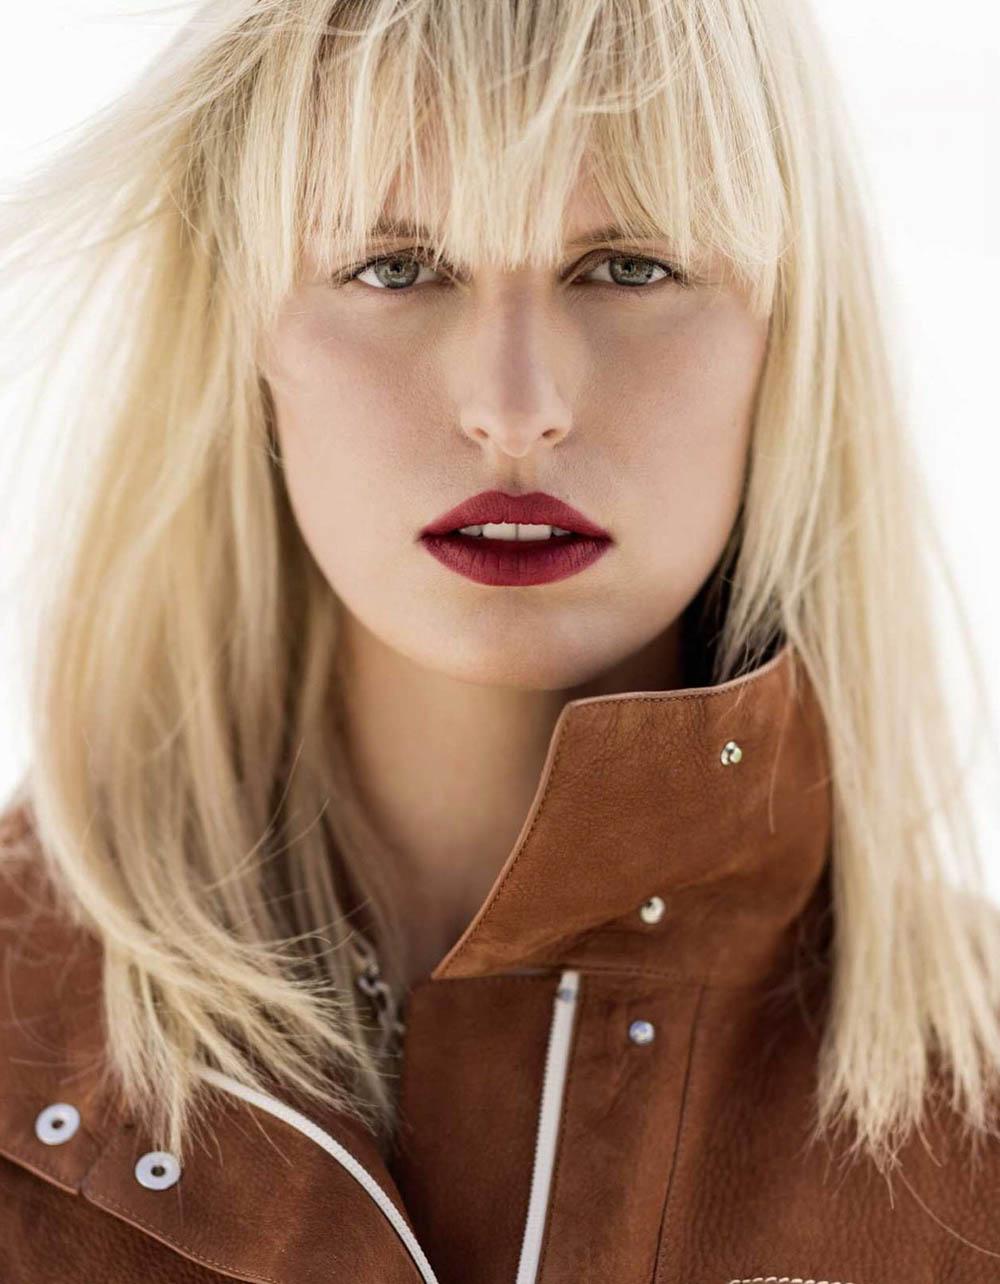 Karolina Kurkova covers Elle Russia January 2018 by Gilles Bensimon